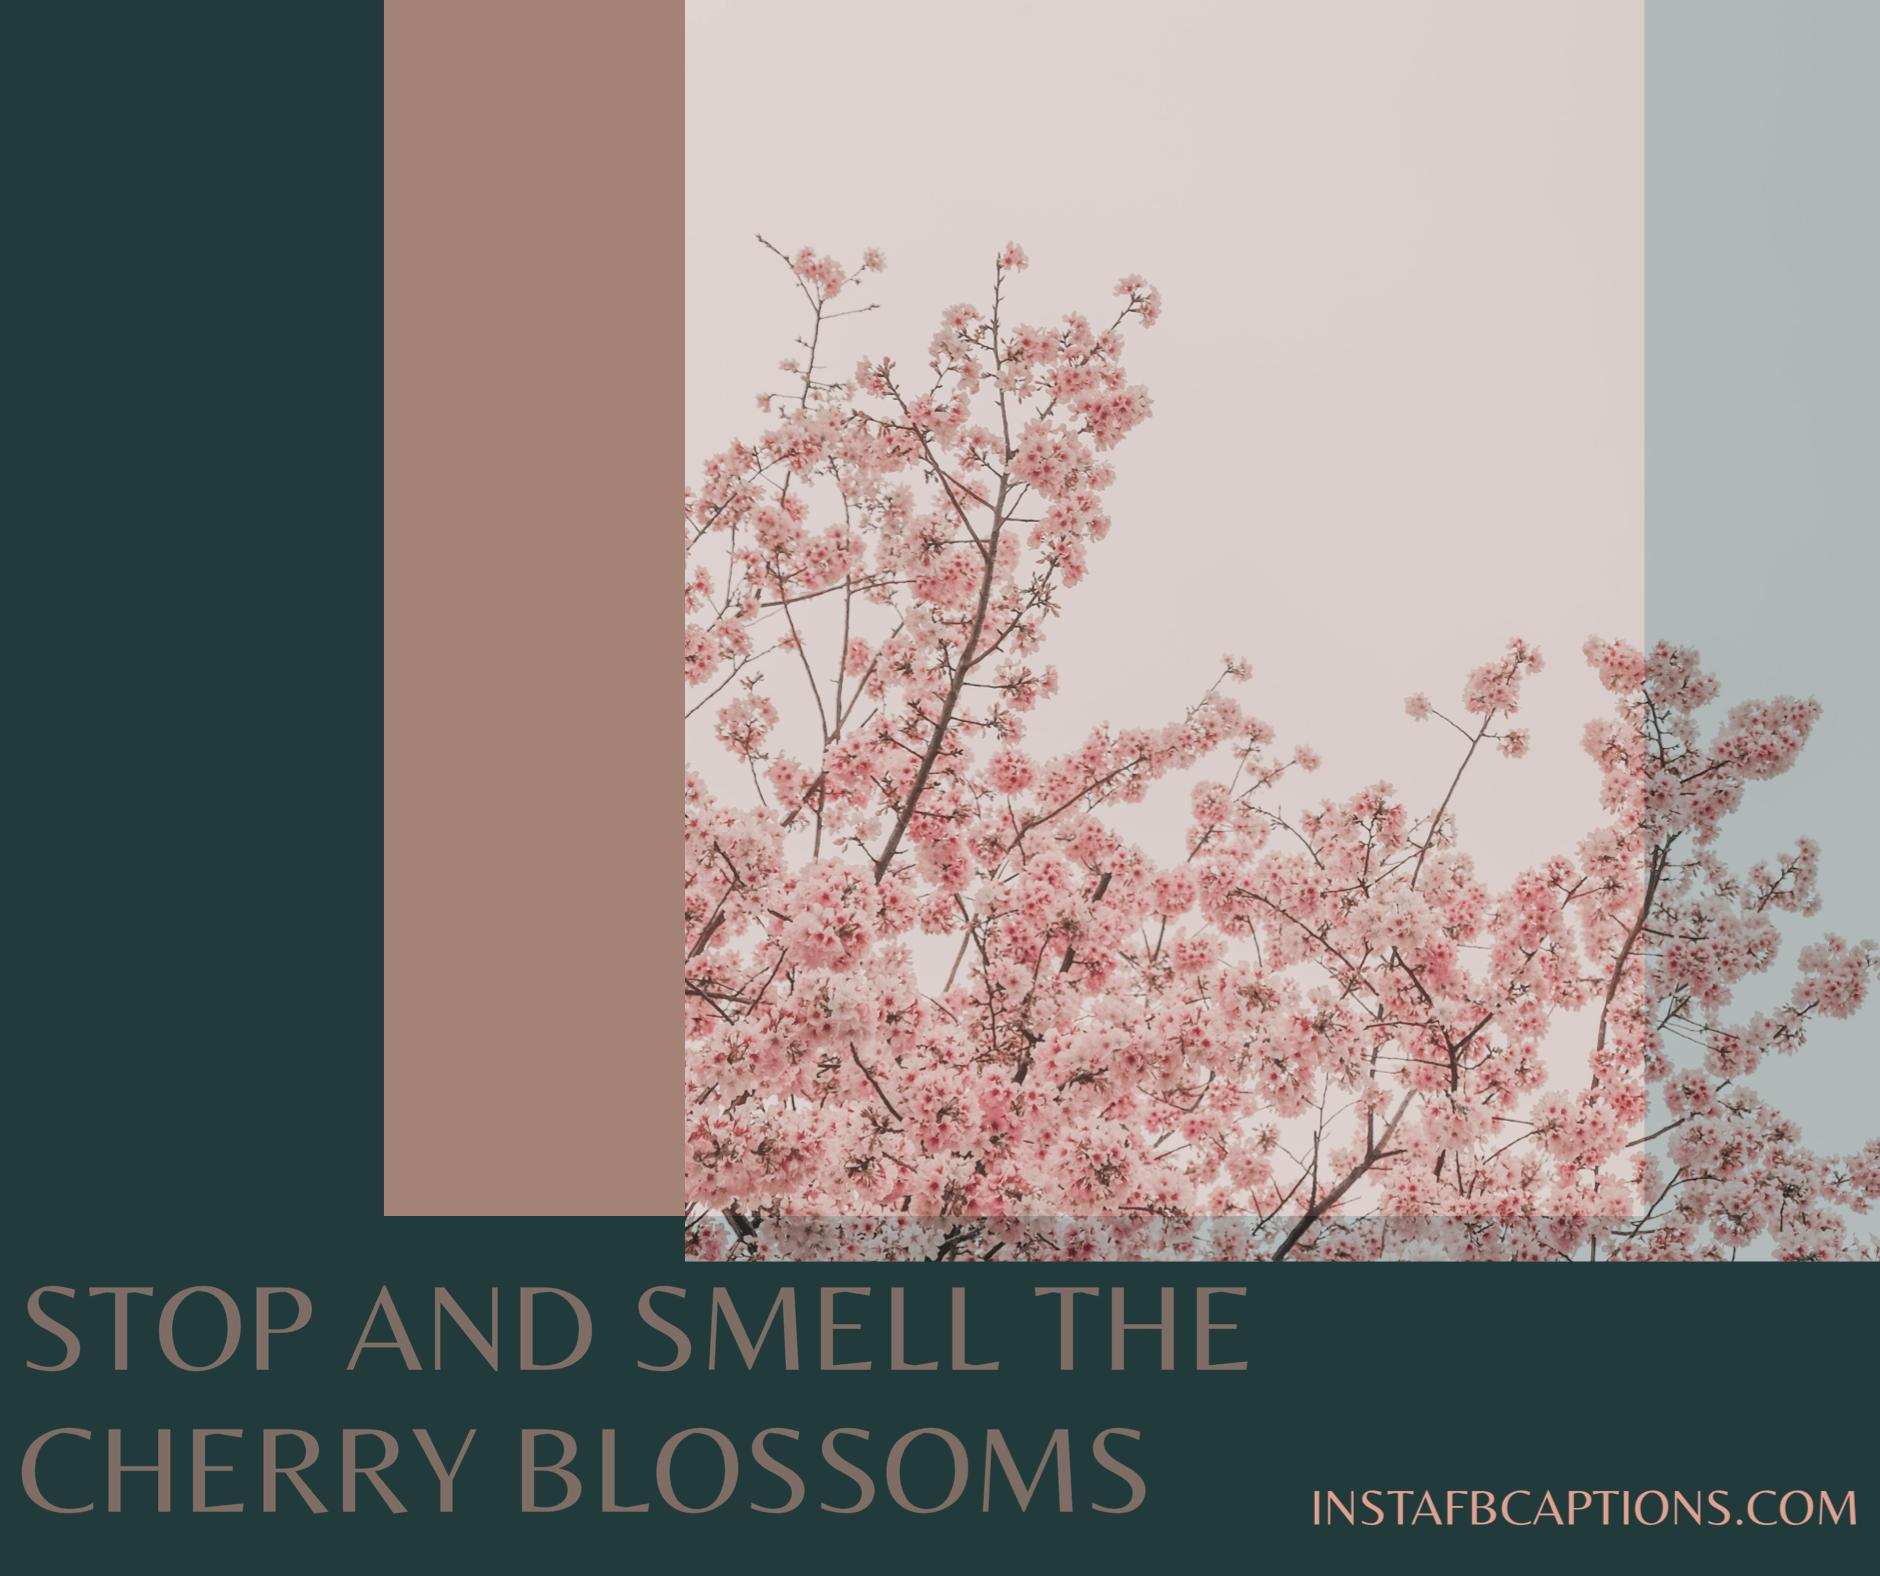 Cherry Blossom Quotes  - Cherry Blossom Quotes - 150+ Best SPRING Instagram Captions 2021